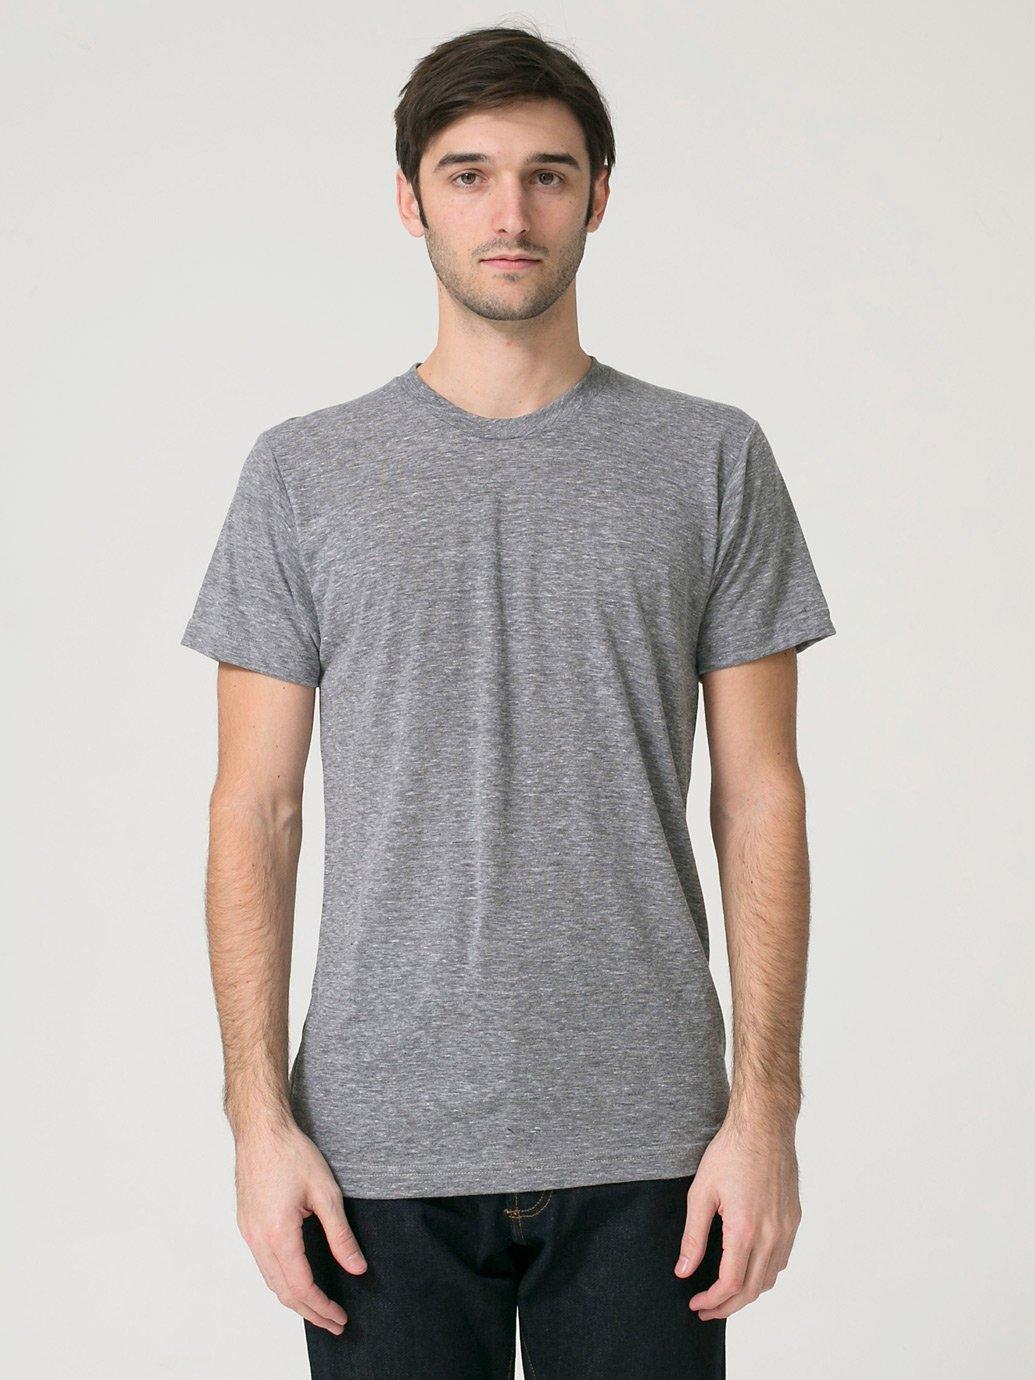 American Apparel Tri Blend Short Sleeve Track Shirt Evan